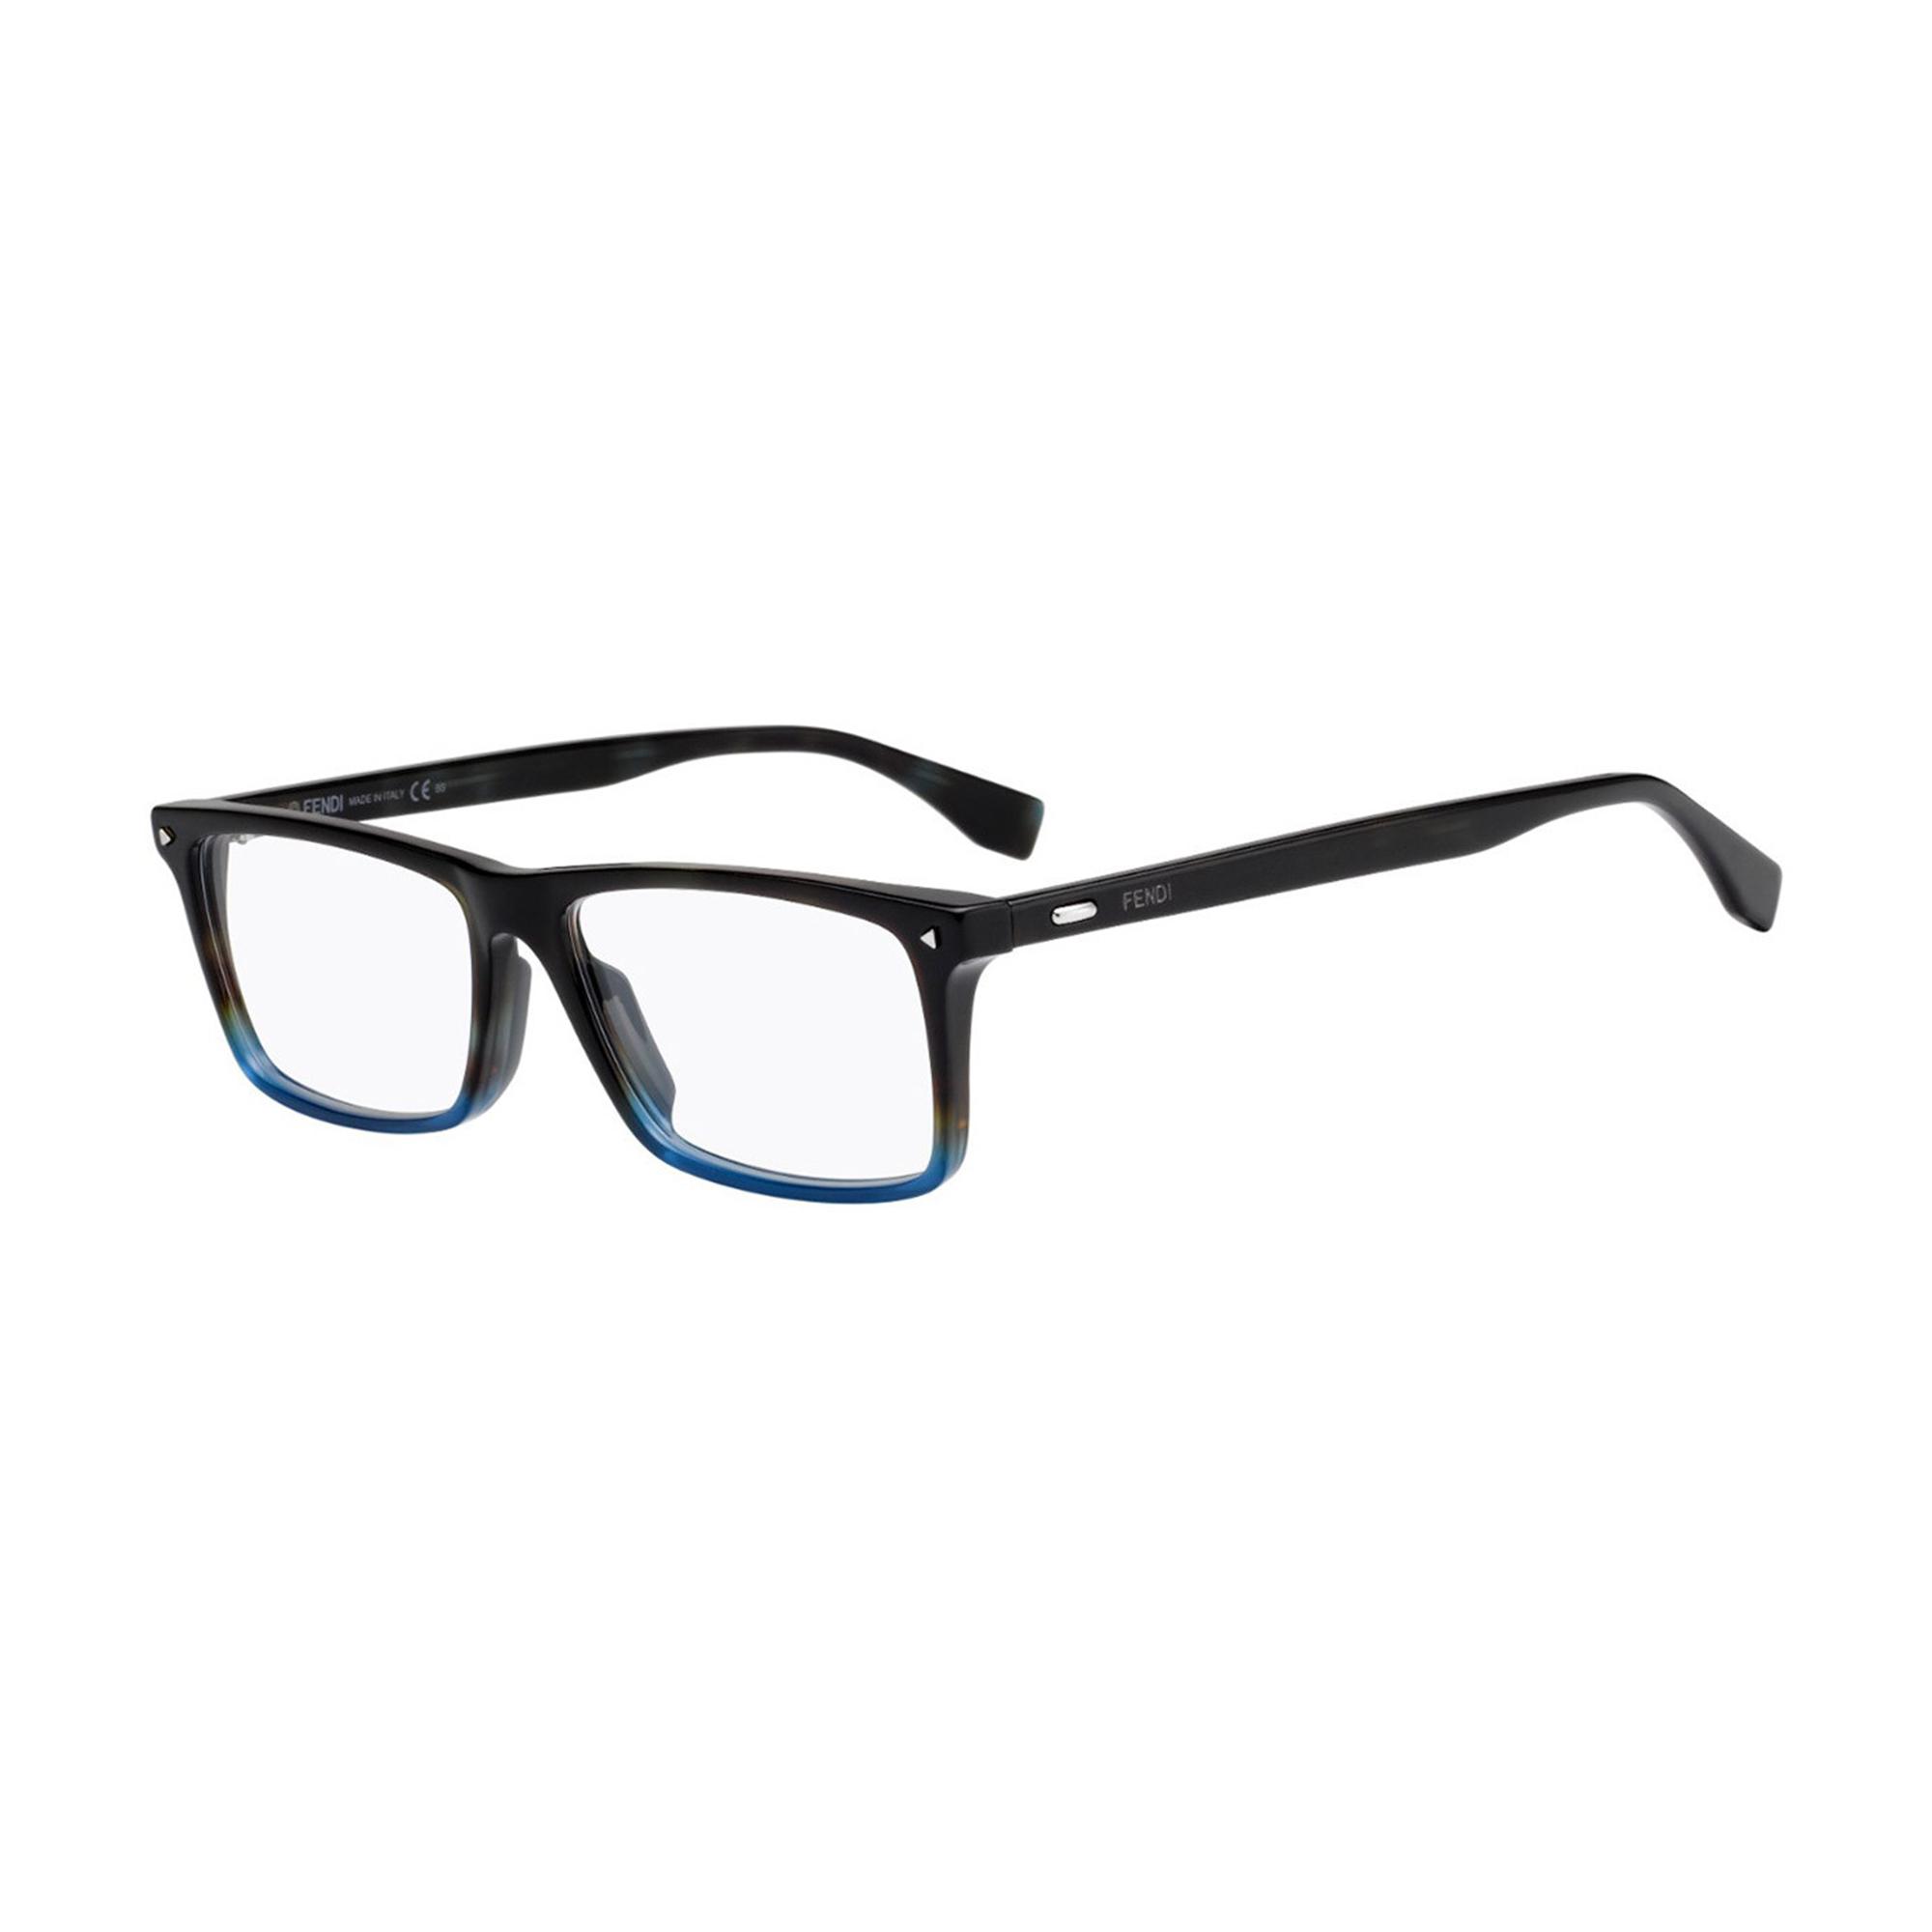 b1c6d46ee0c Fendi    Rectangular Eyeglass Frames    Dark Havana Fade to Blue - Designer  Optical - Touch of Modern